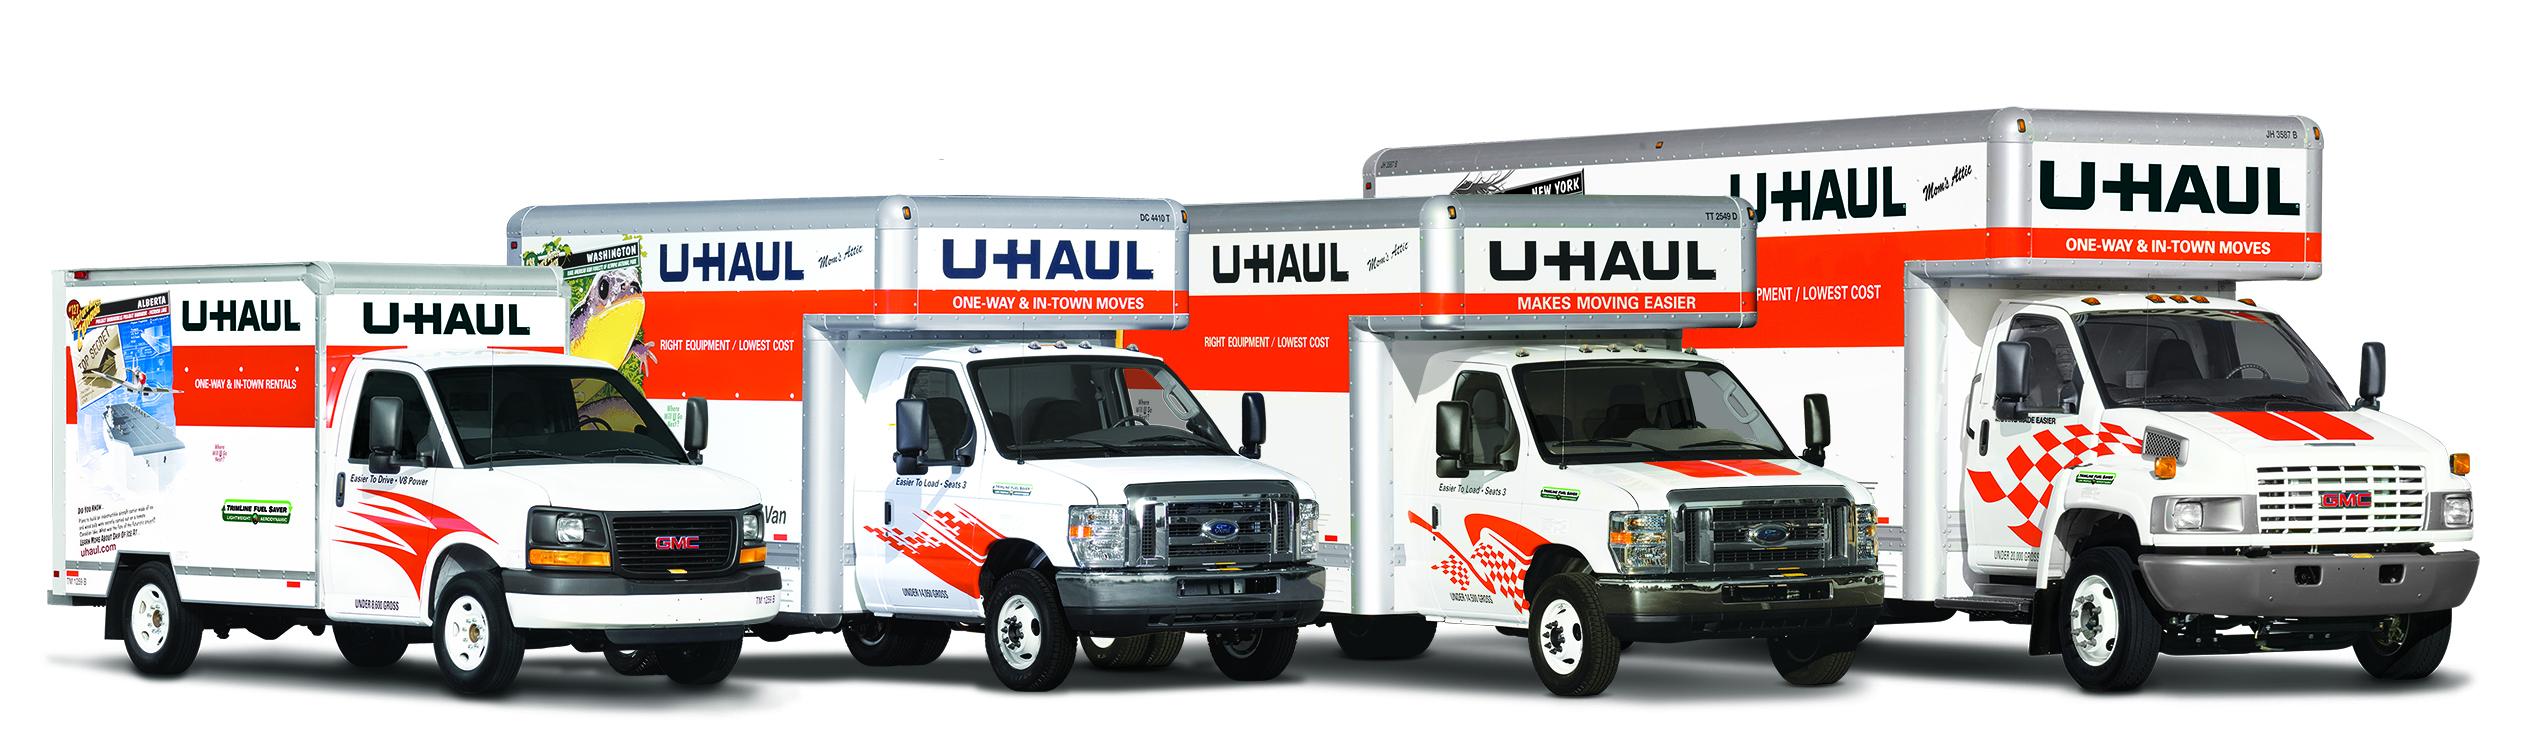 U Haul Quote Uhaul Rentals Deboer's Auto Hamburg New Jersey